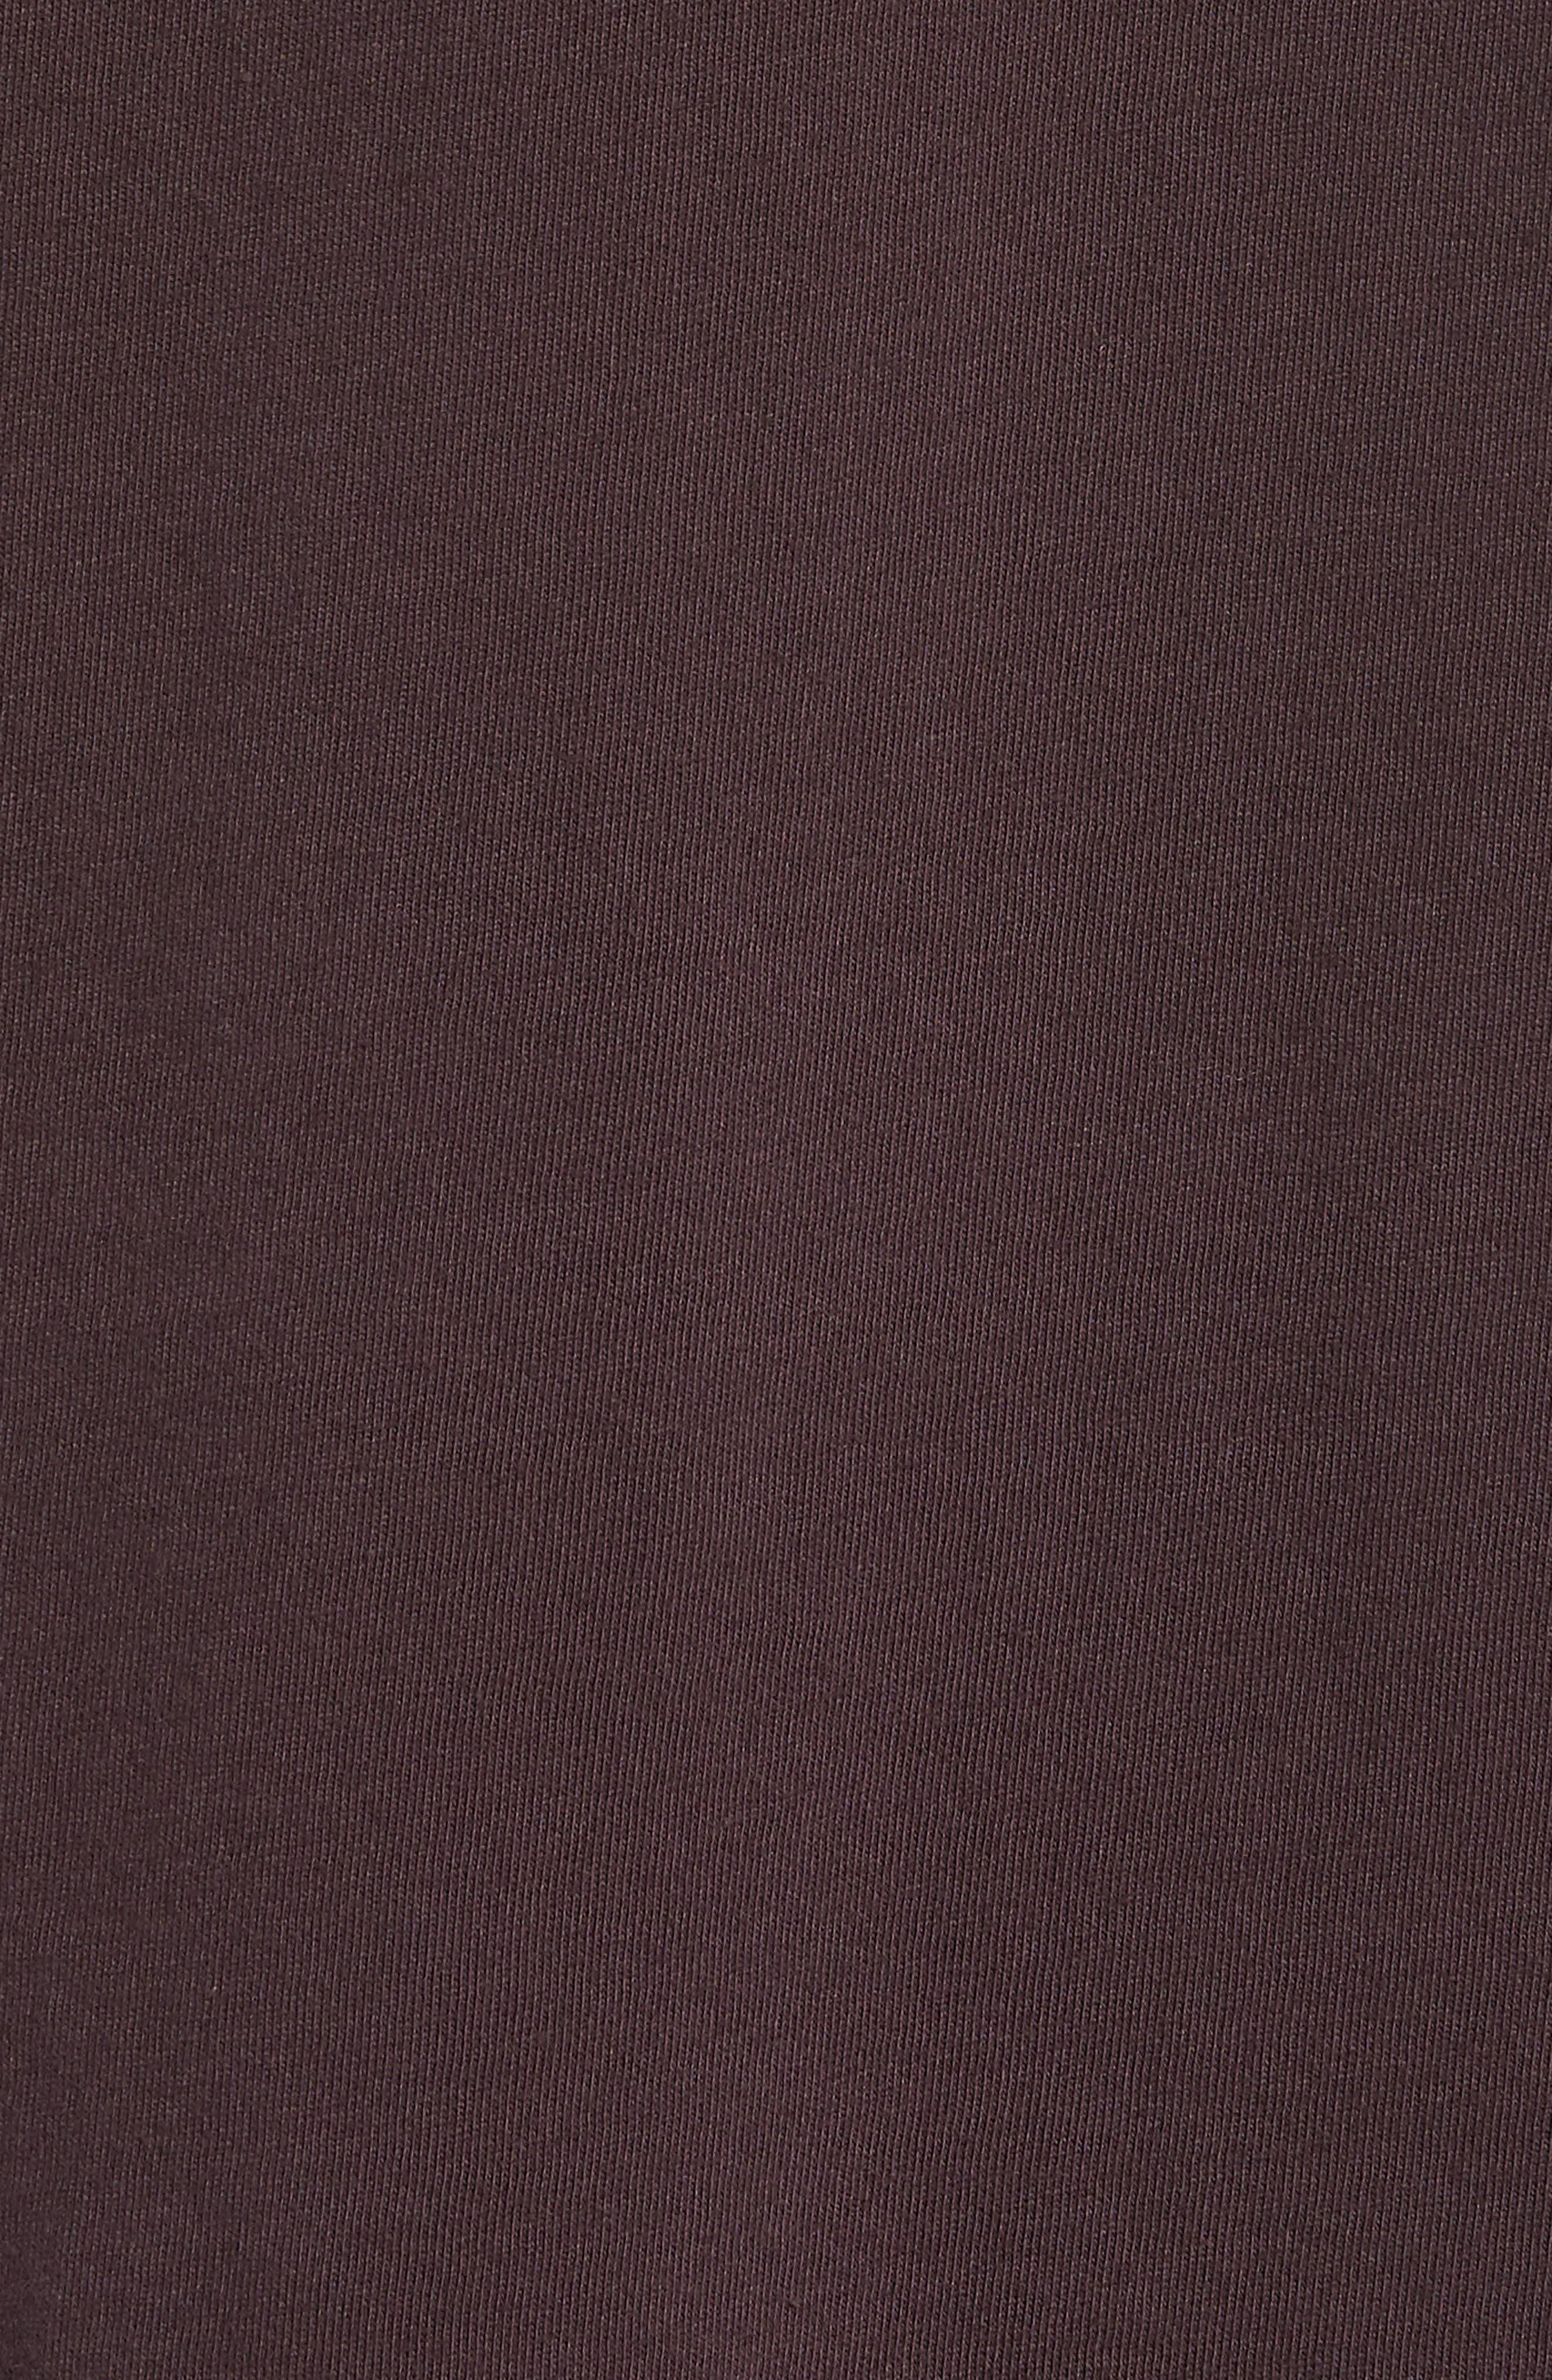 UE Pyramid T-Shirt,                             Alternate thumbnail 5, color,                             WINE